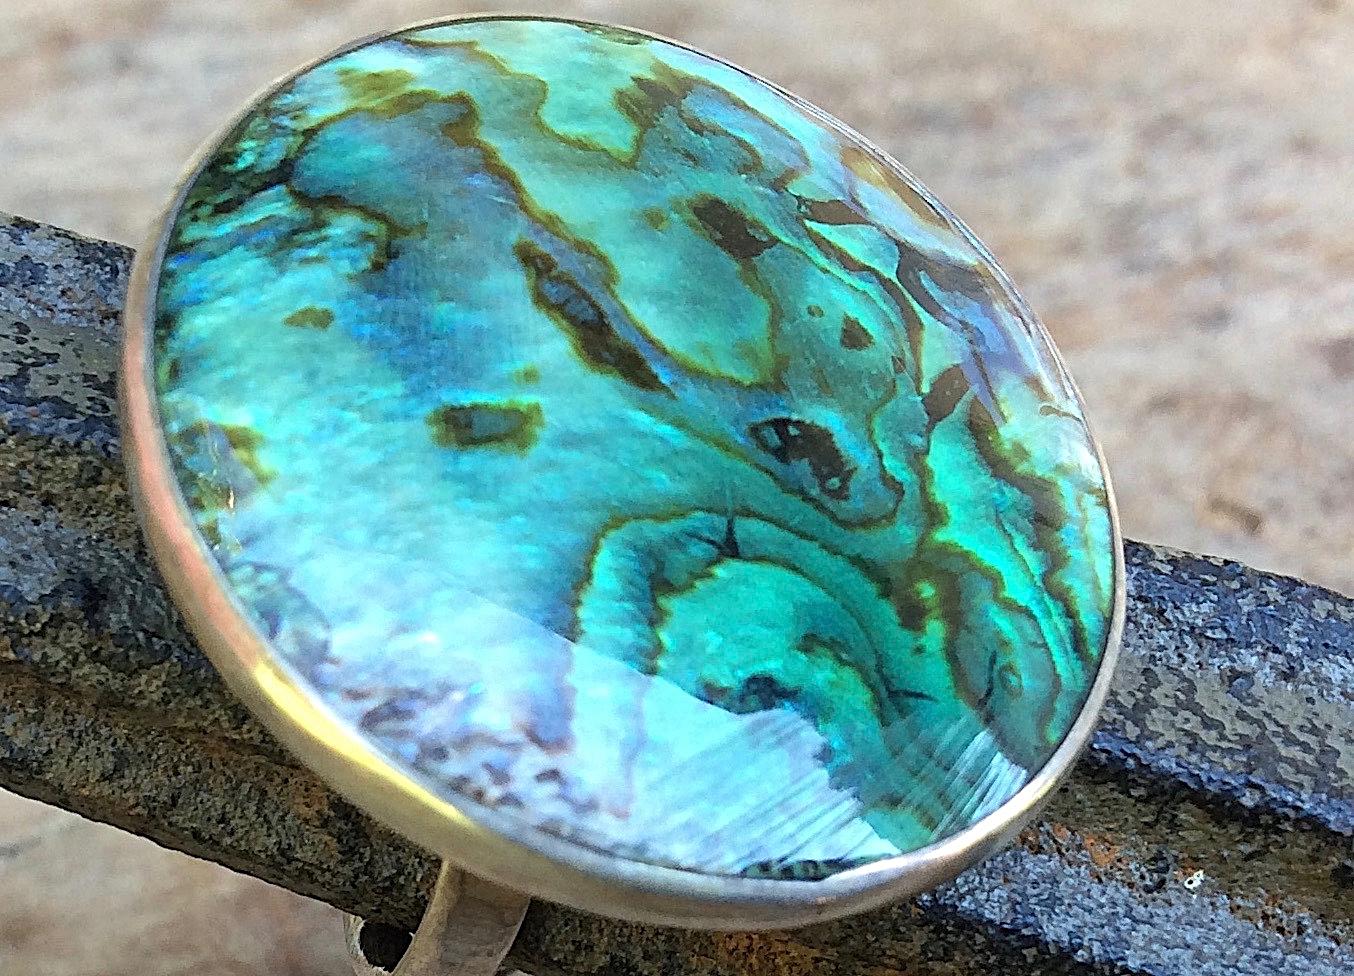 Silberring mit großem runden Stein in Abalony Südseeperlmutt